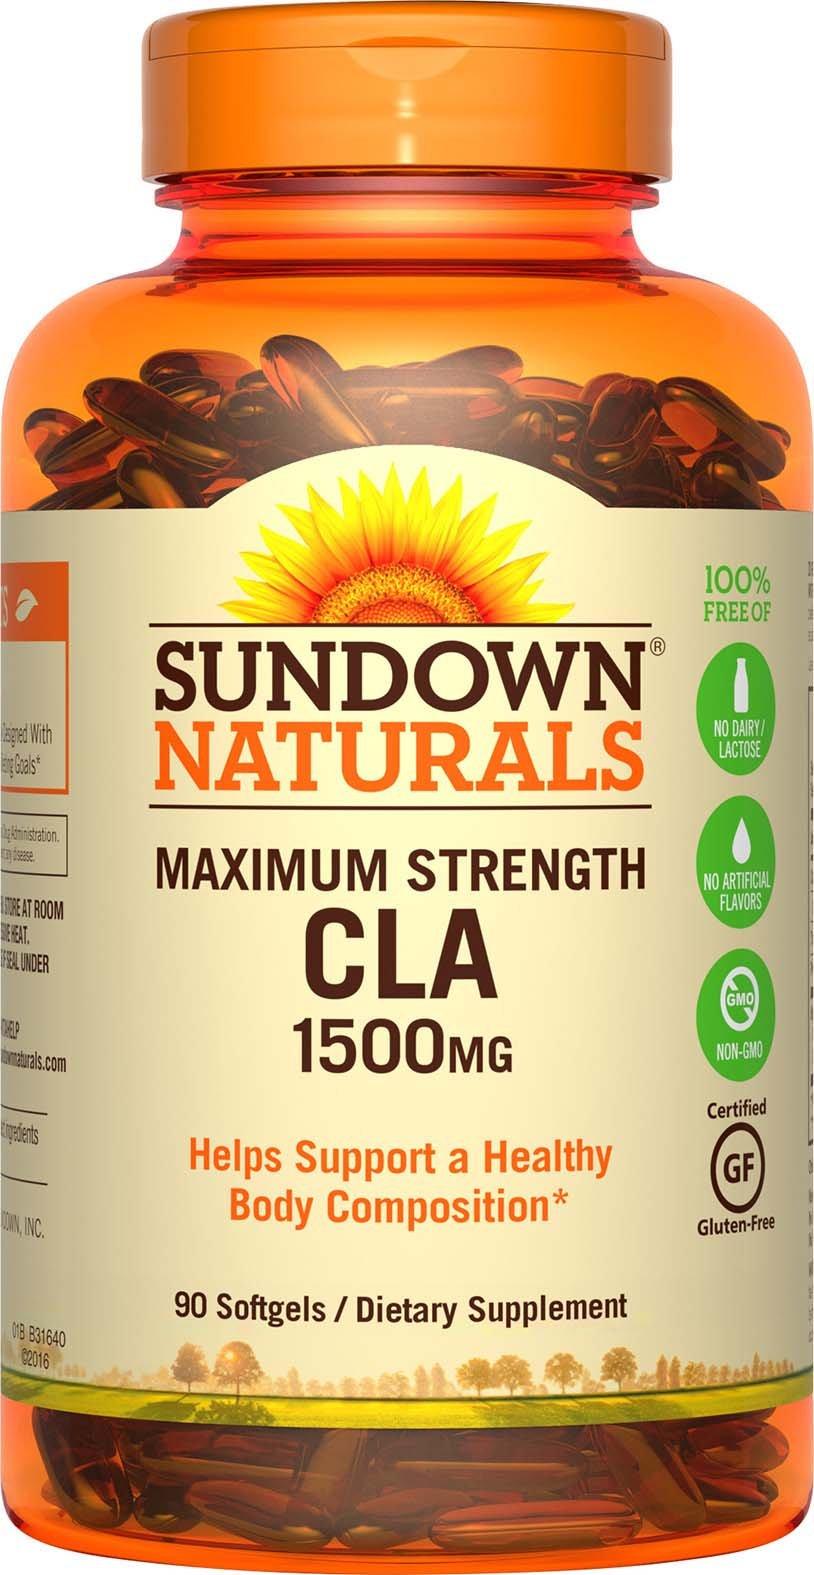 Sundown Naturals Maximum Strength CLA 1500 mg Softgels - 90 ct, Pack of 2  - Packaging May Vary by Sundown Naturals